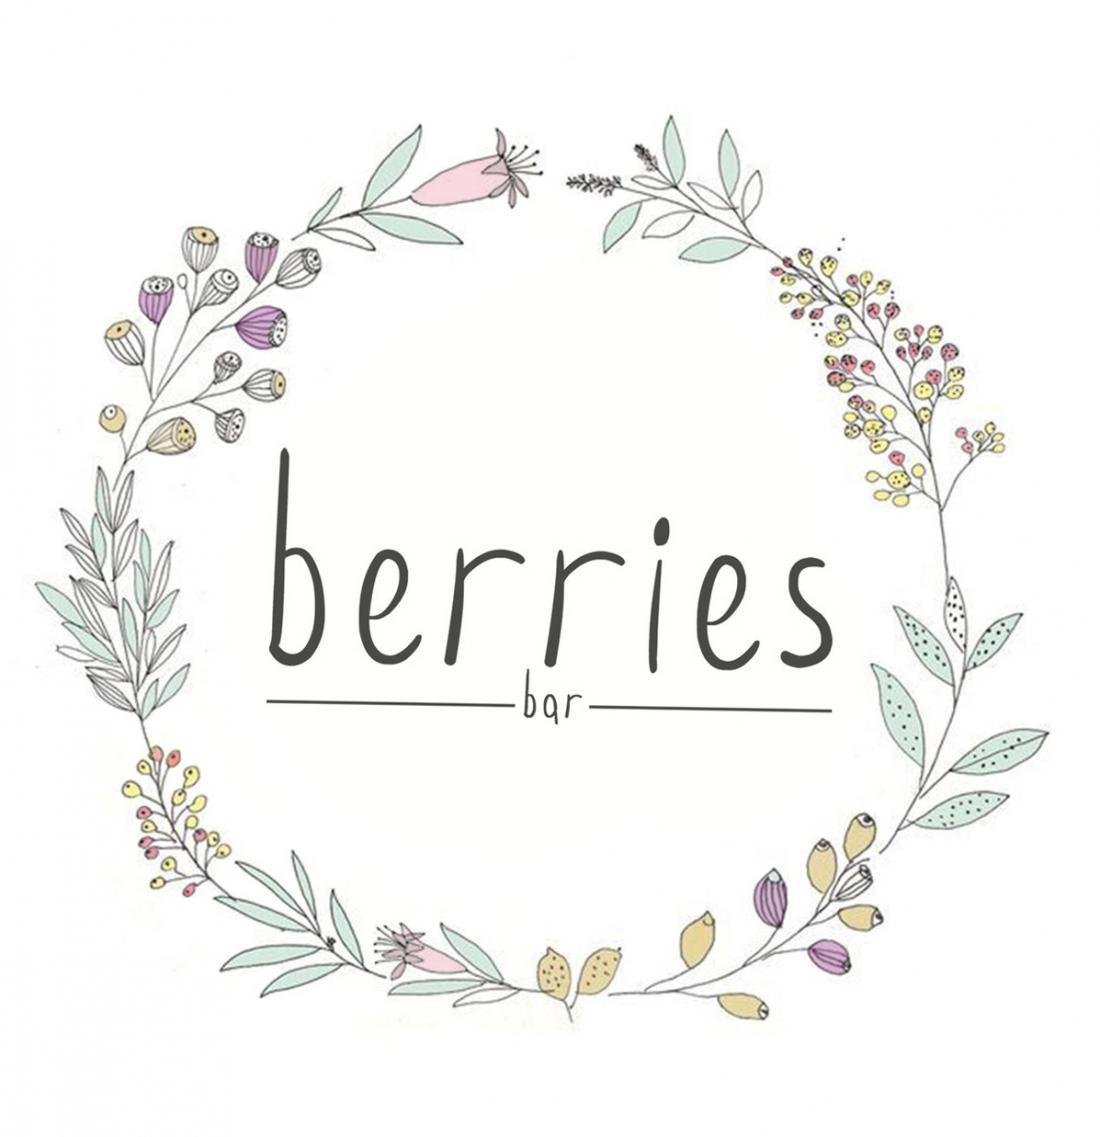 "Клубника в шоколаде от 12 руб, букеты из фруктов, мужские букеты от 30 руб. от интернет-магазина ""Berriesbar"""